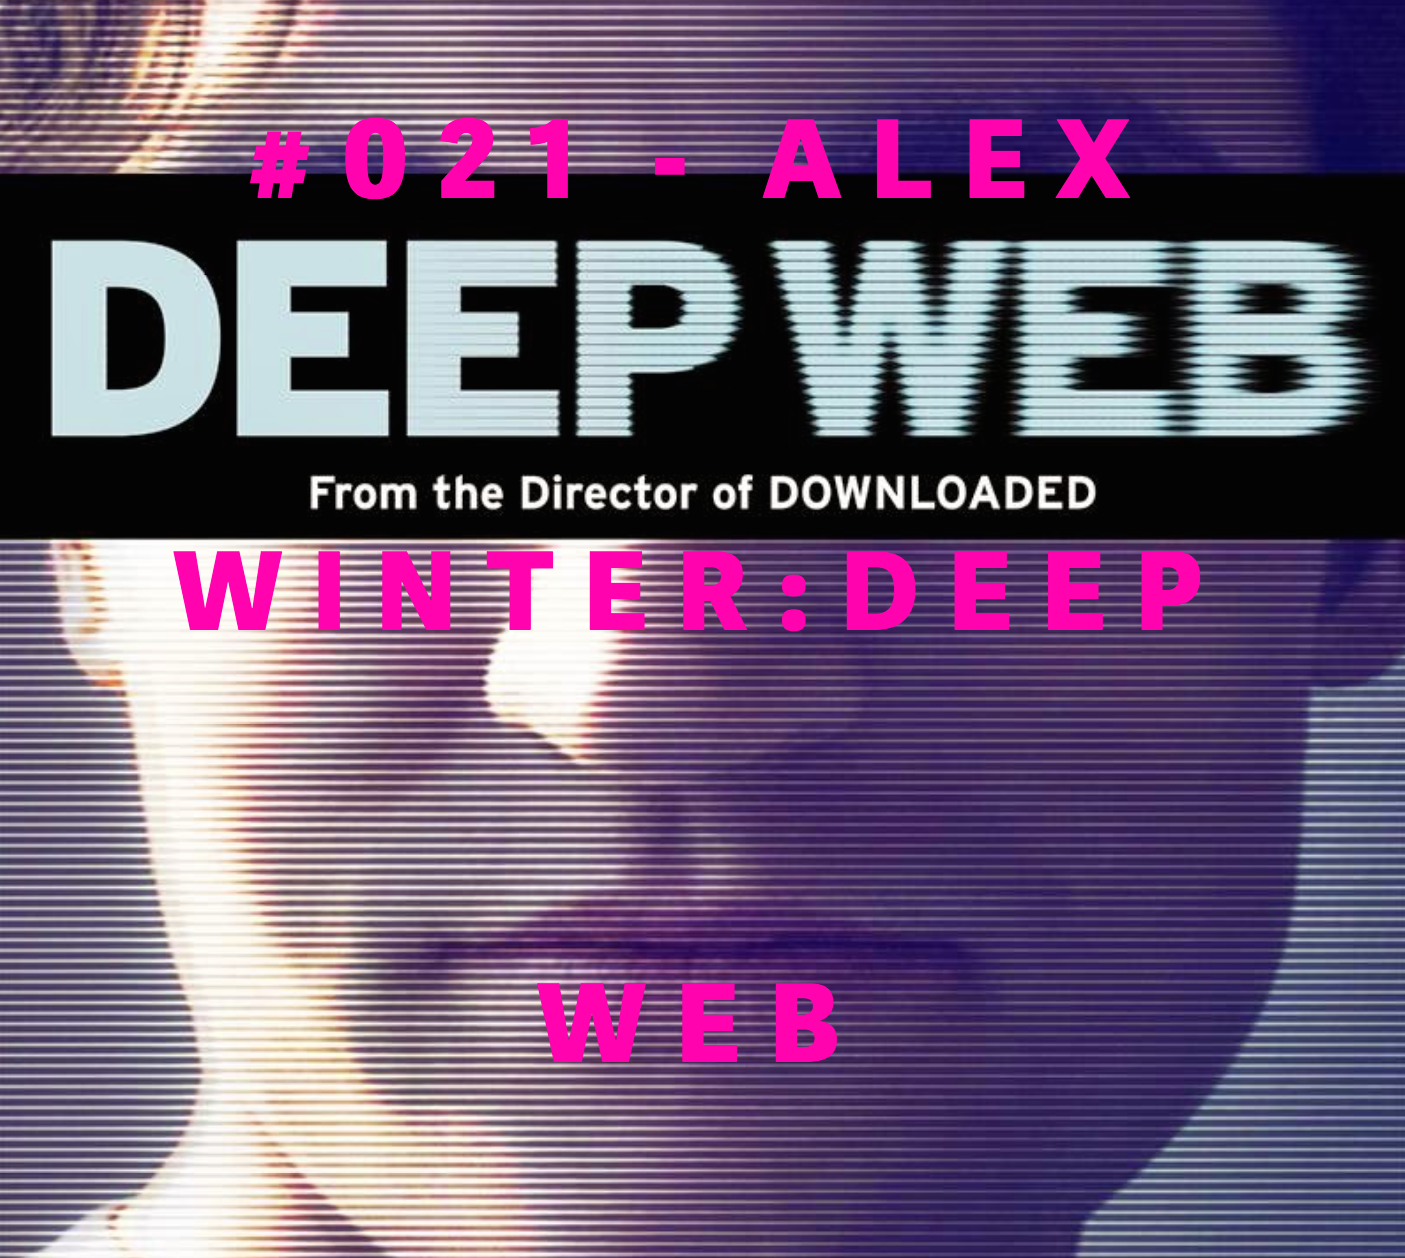 ALEX WINTER  #021-DEEP WEB SILK ROAD